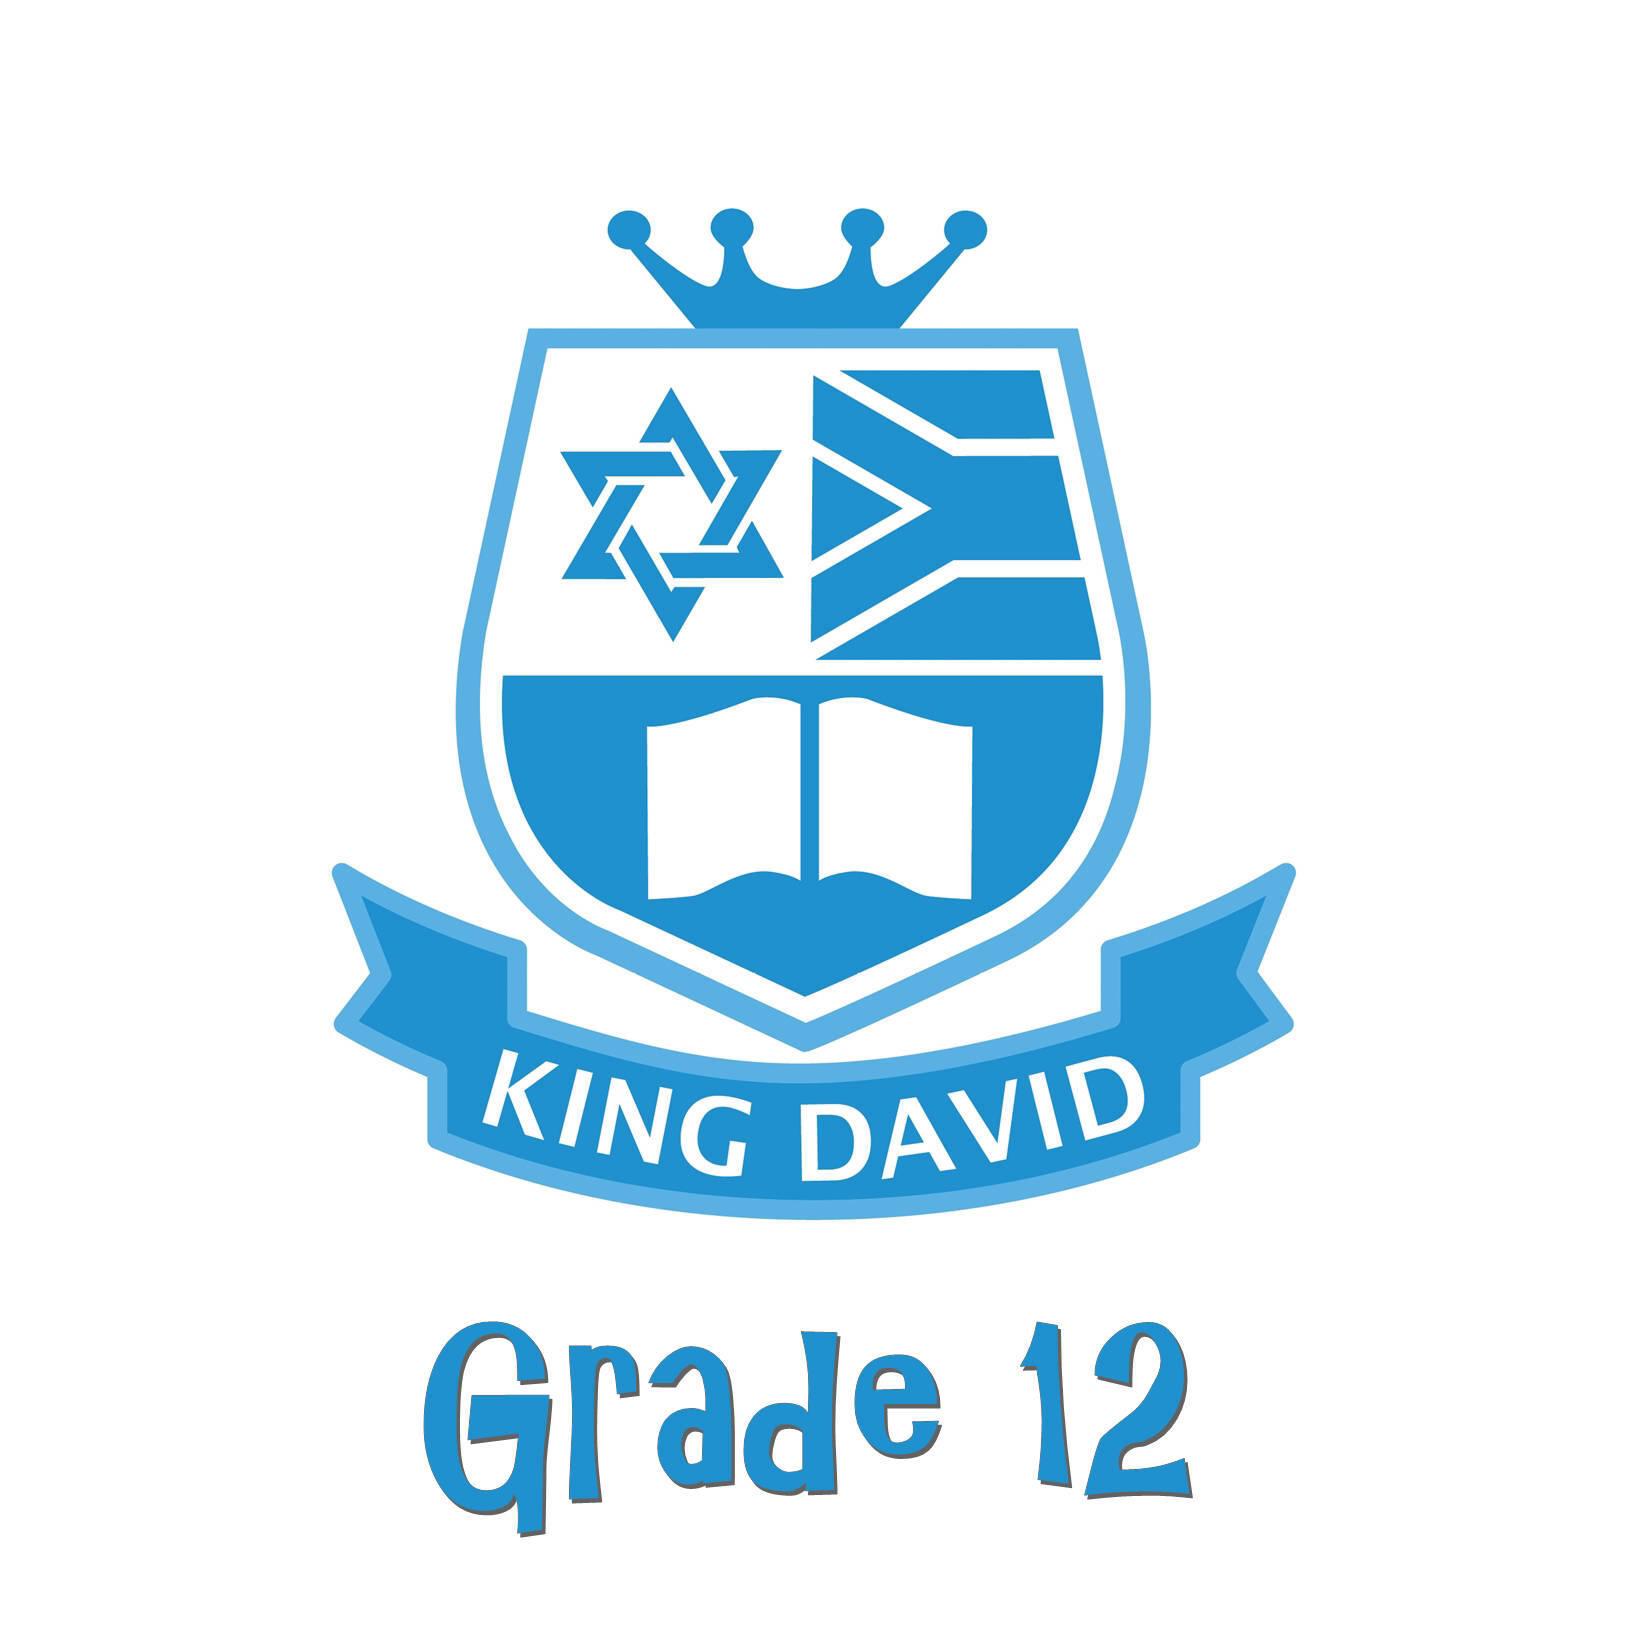 King David Victory Park Grade 12